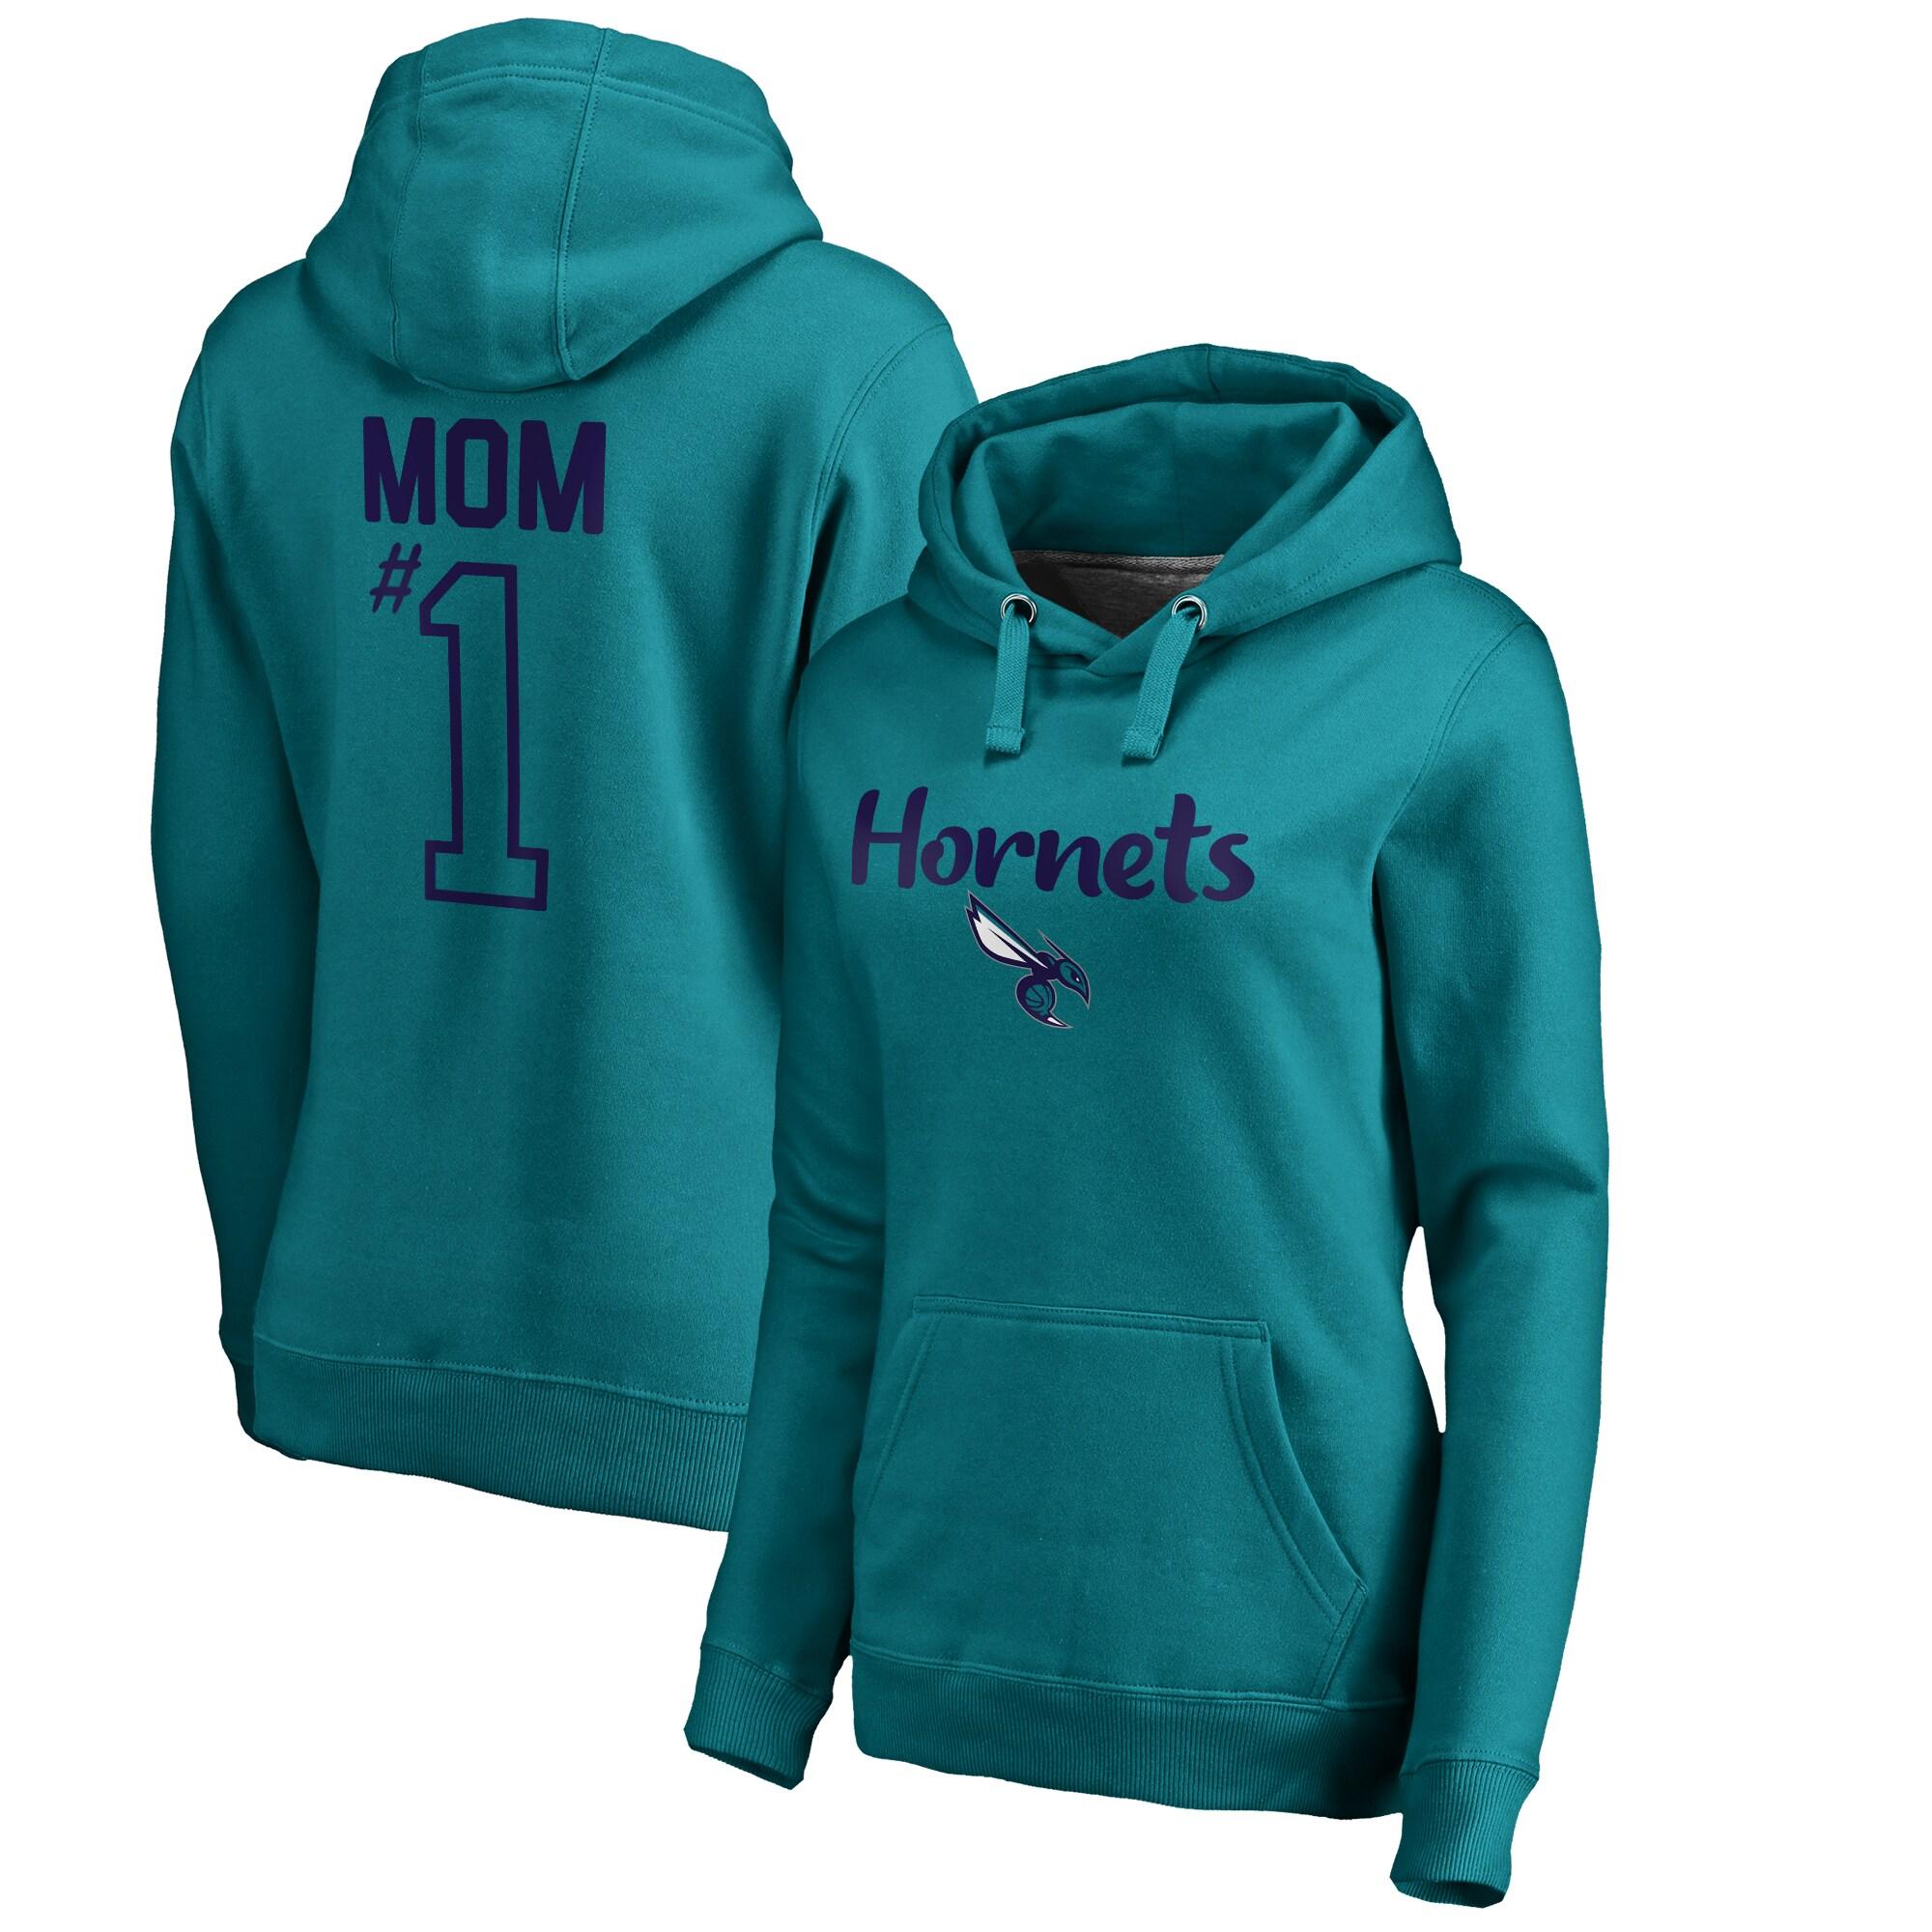 Charlotte Hornets Fanatics Branded Women's #1 Mom Logo Pullover Hoodie - Teal